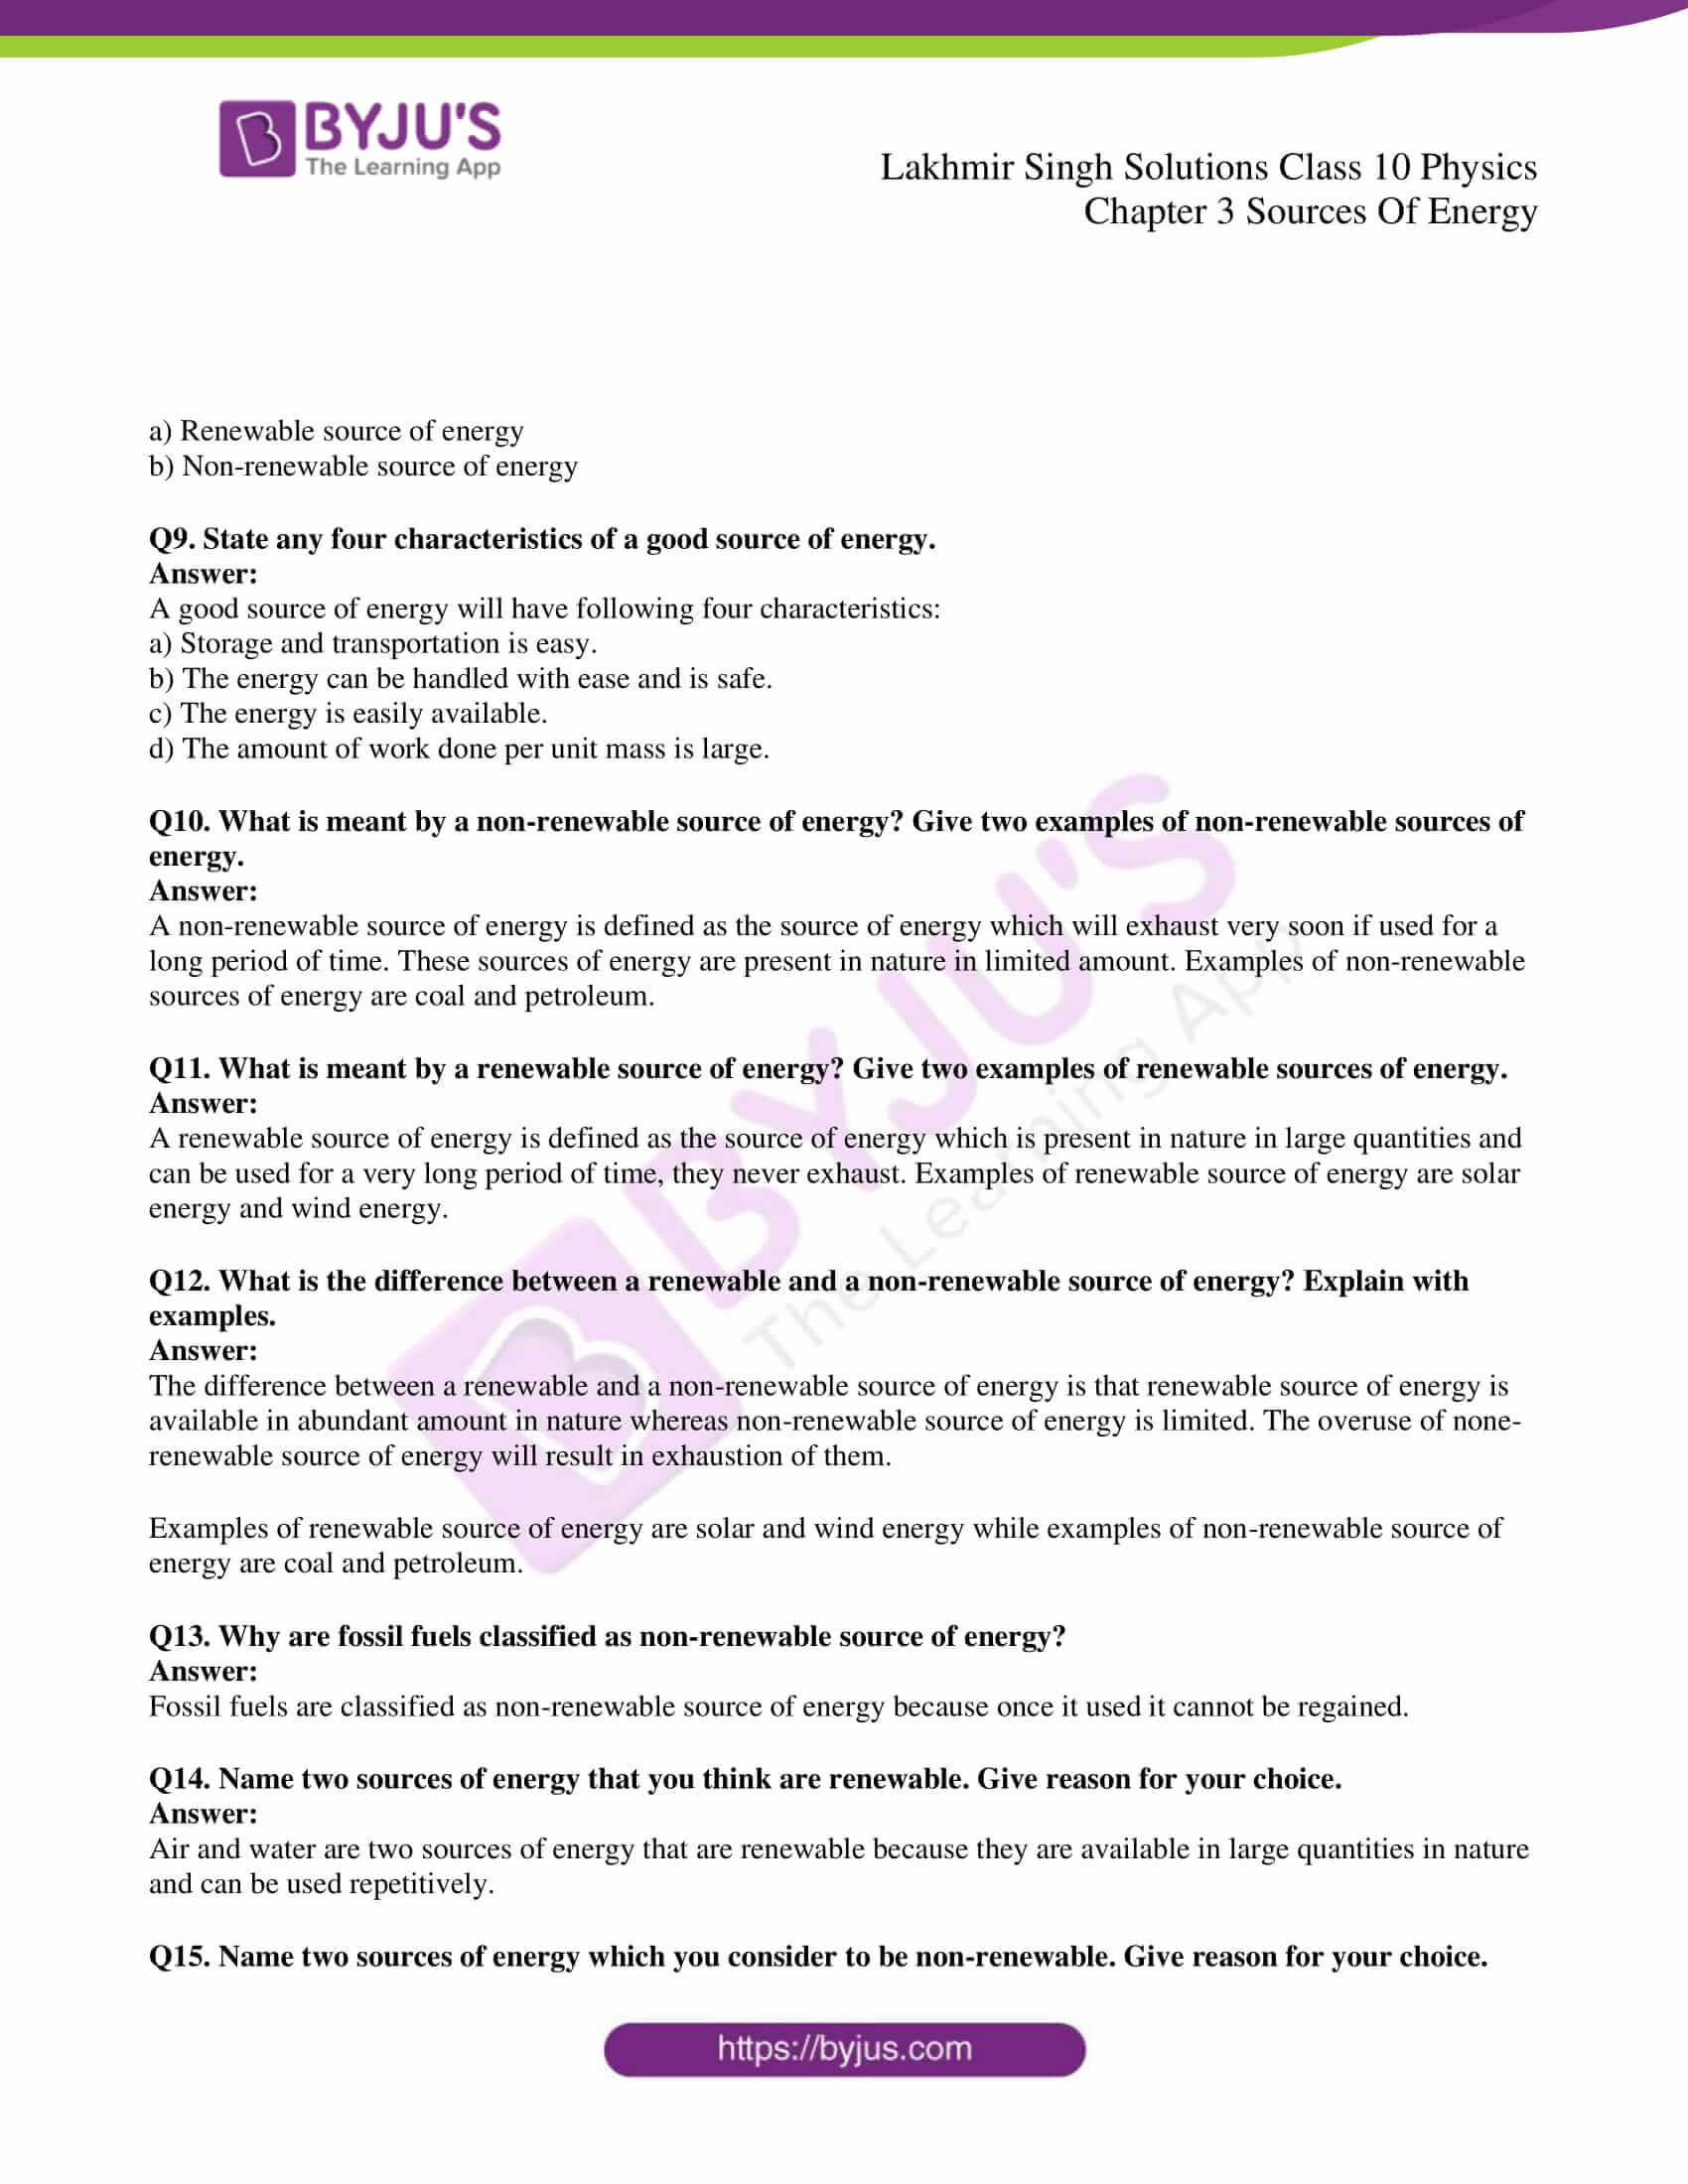 lakhmir singh sol class 10 physics chapter 3 02